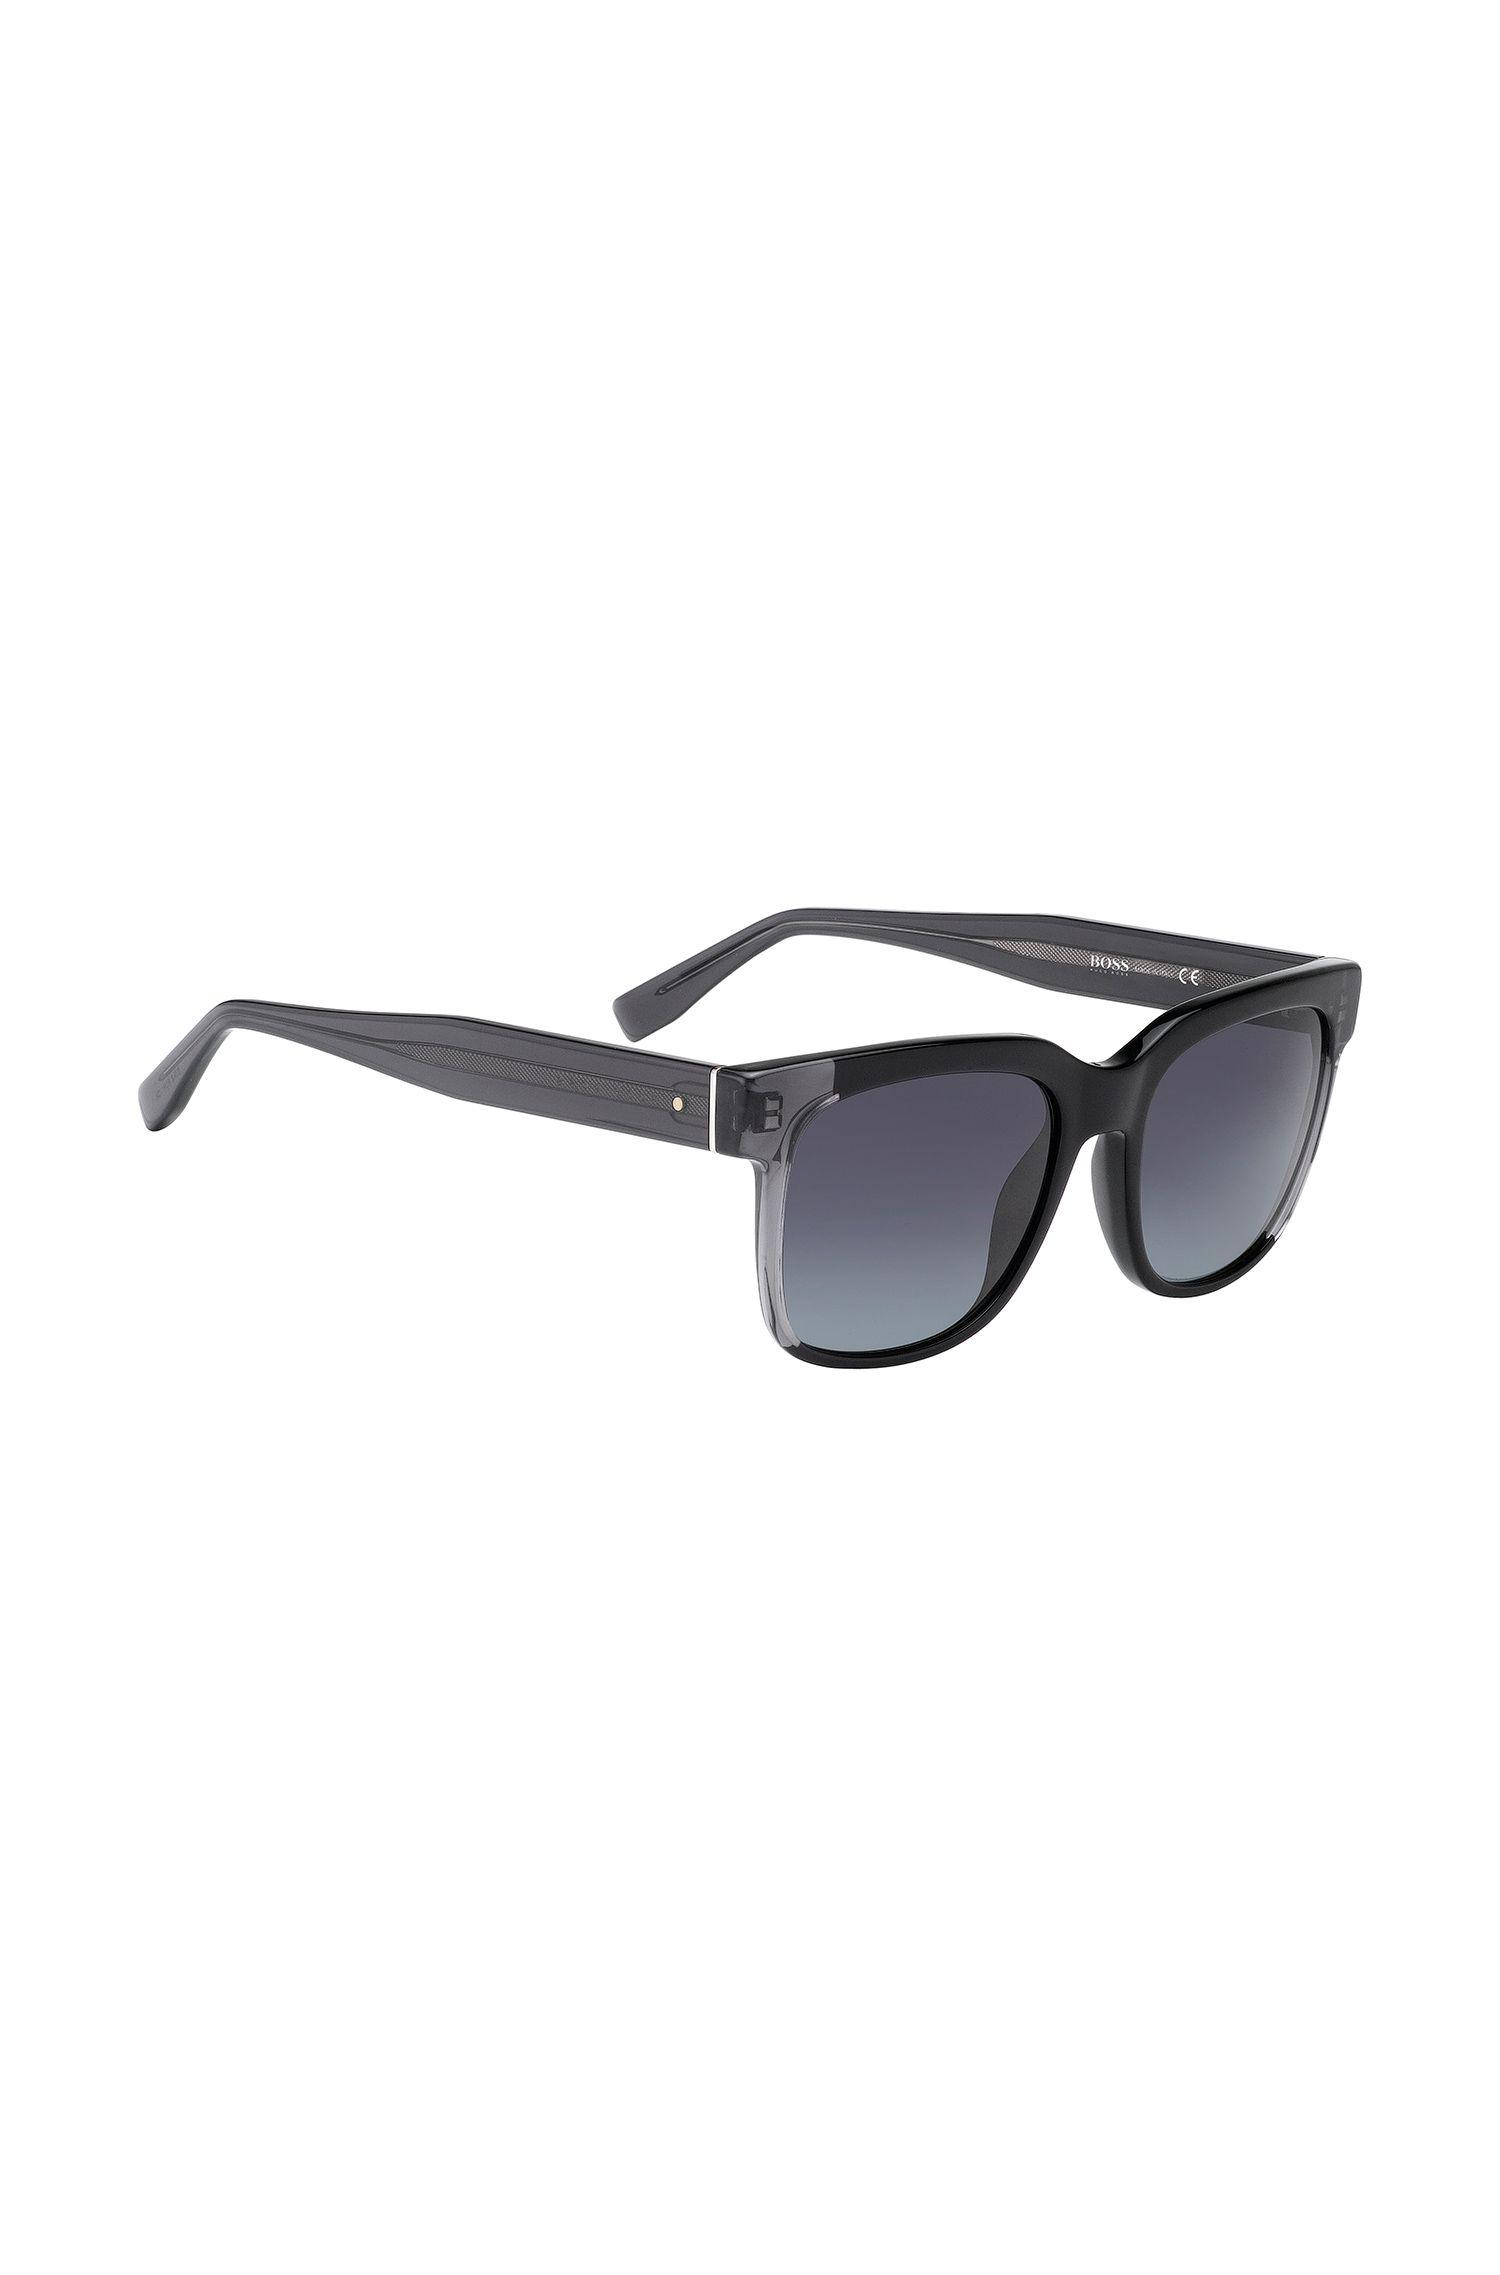 Gafas de sol: 'BOSS 0735/S'